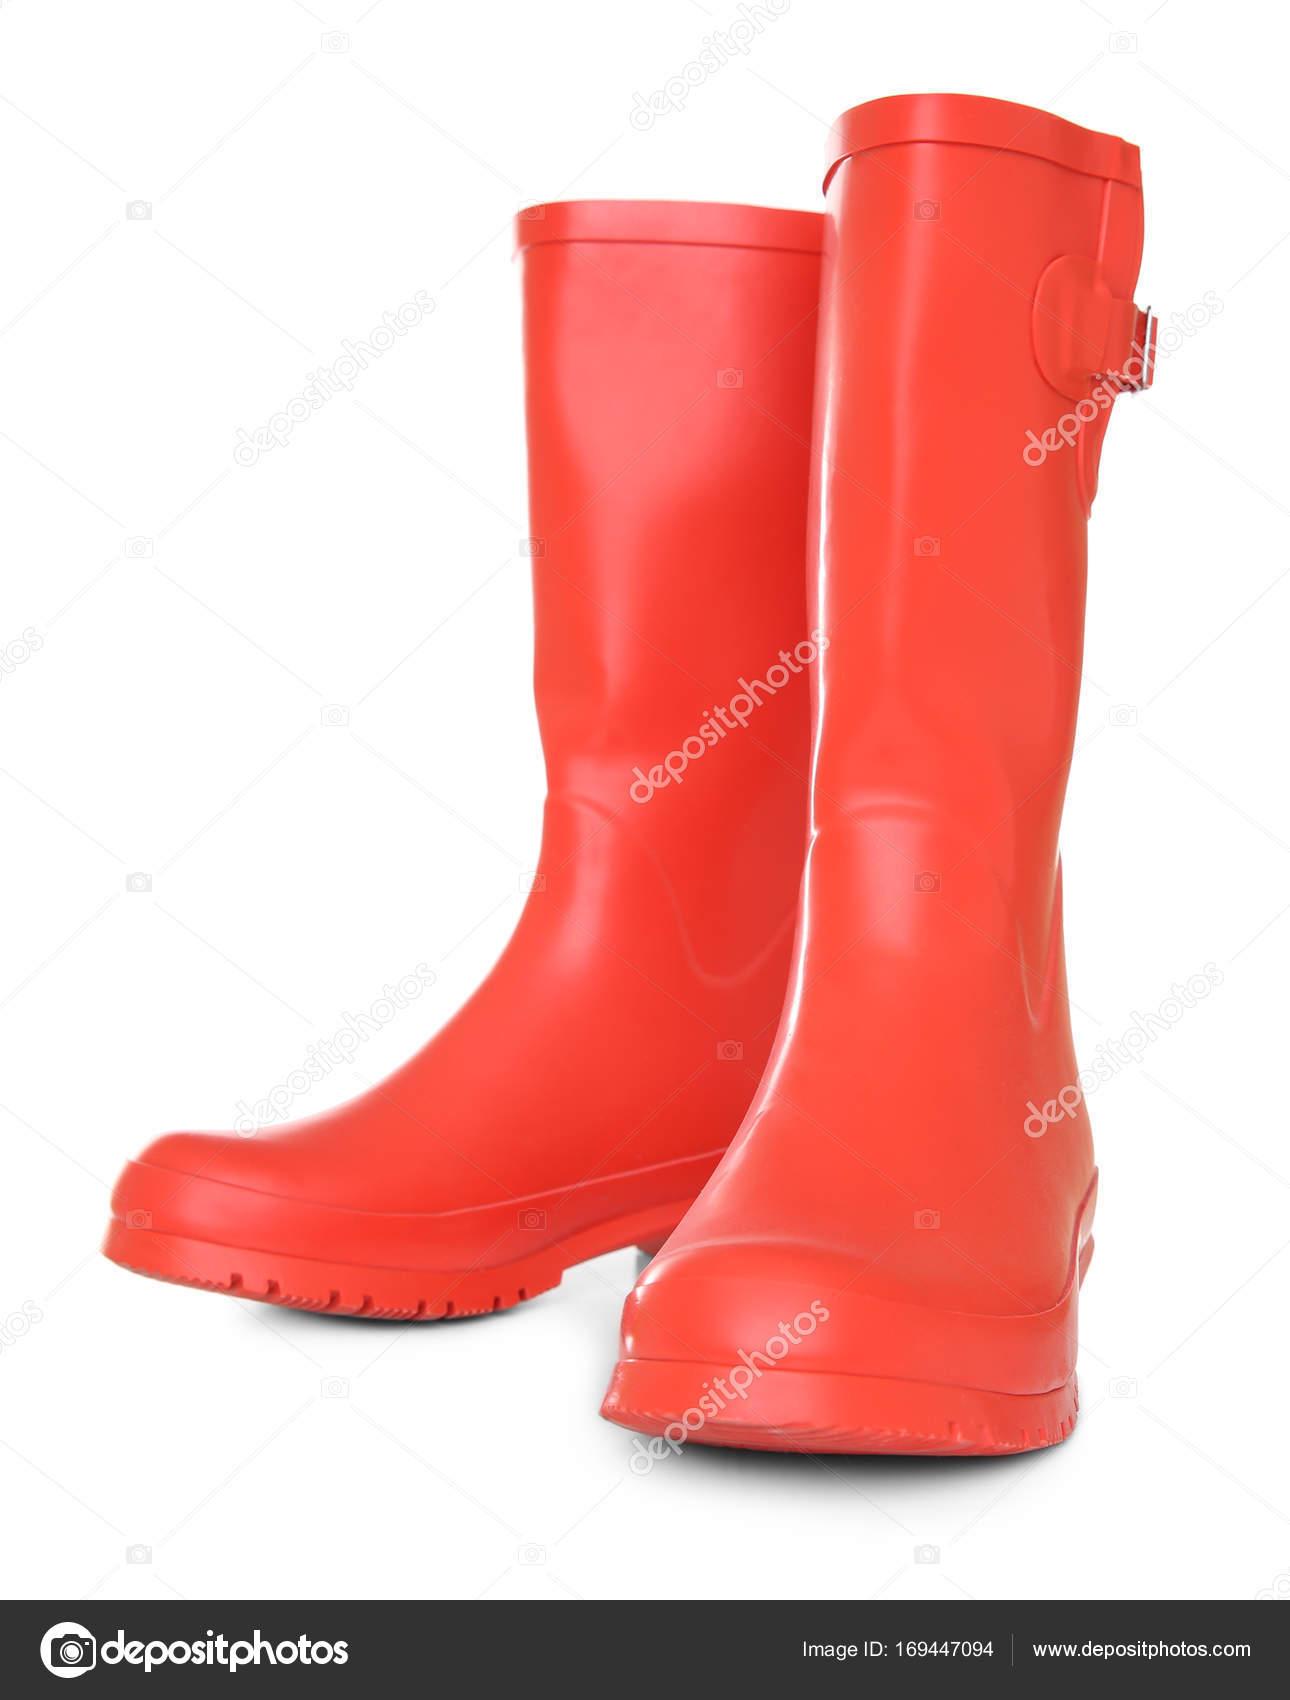 piros gumi fekete punci pron com